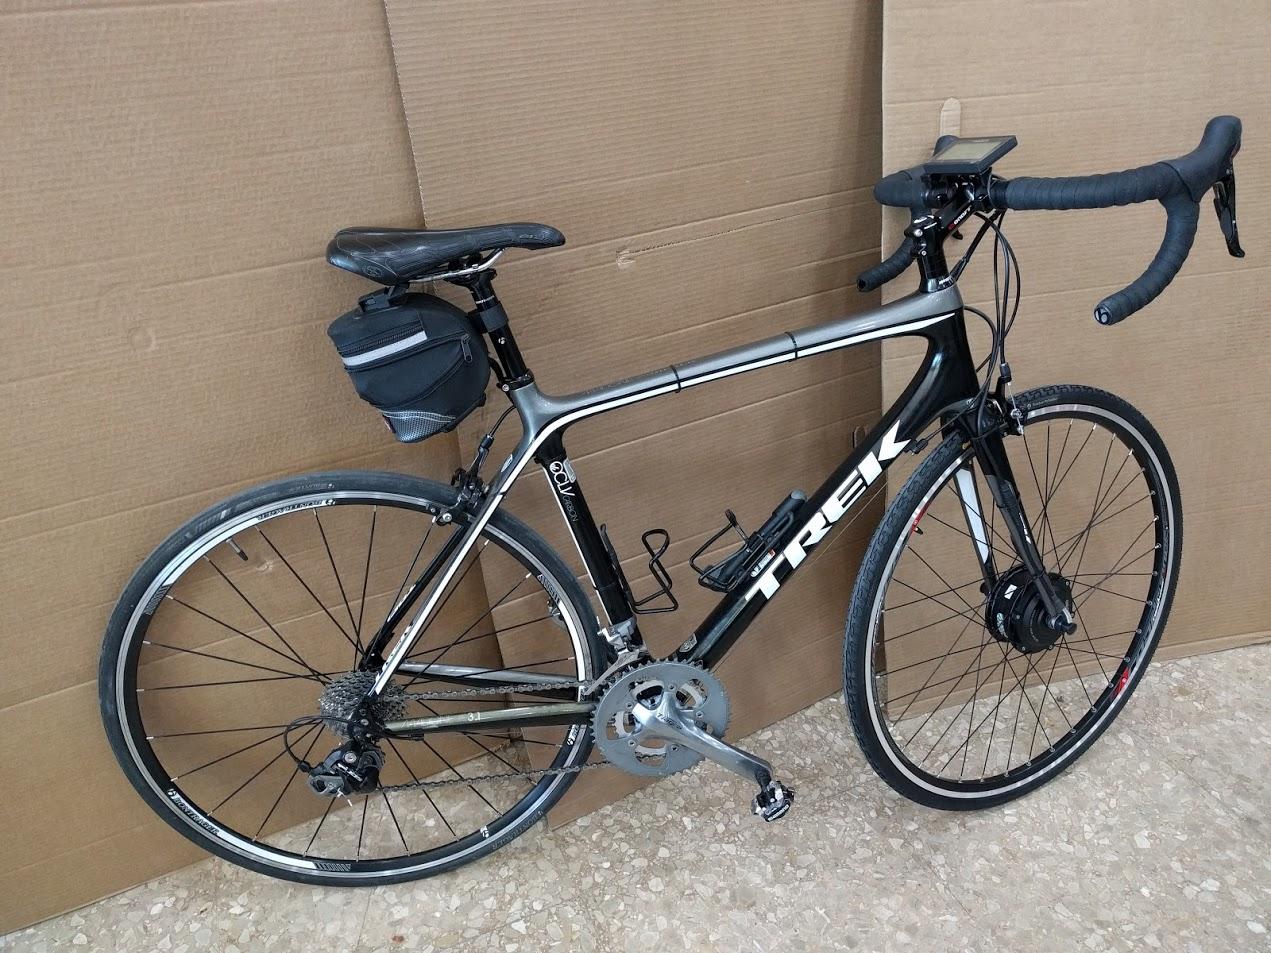 Bicicleta carretera de carbono transformada en bicicleta eléctrica